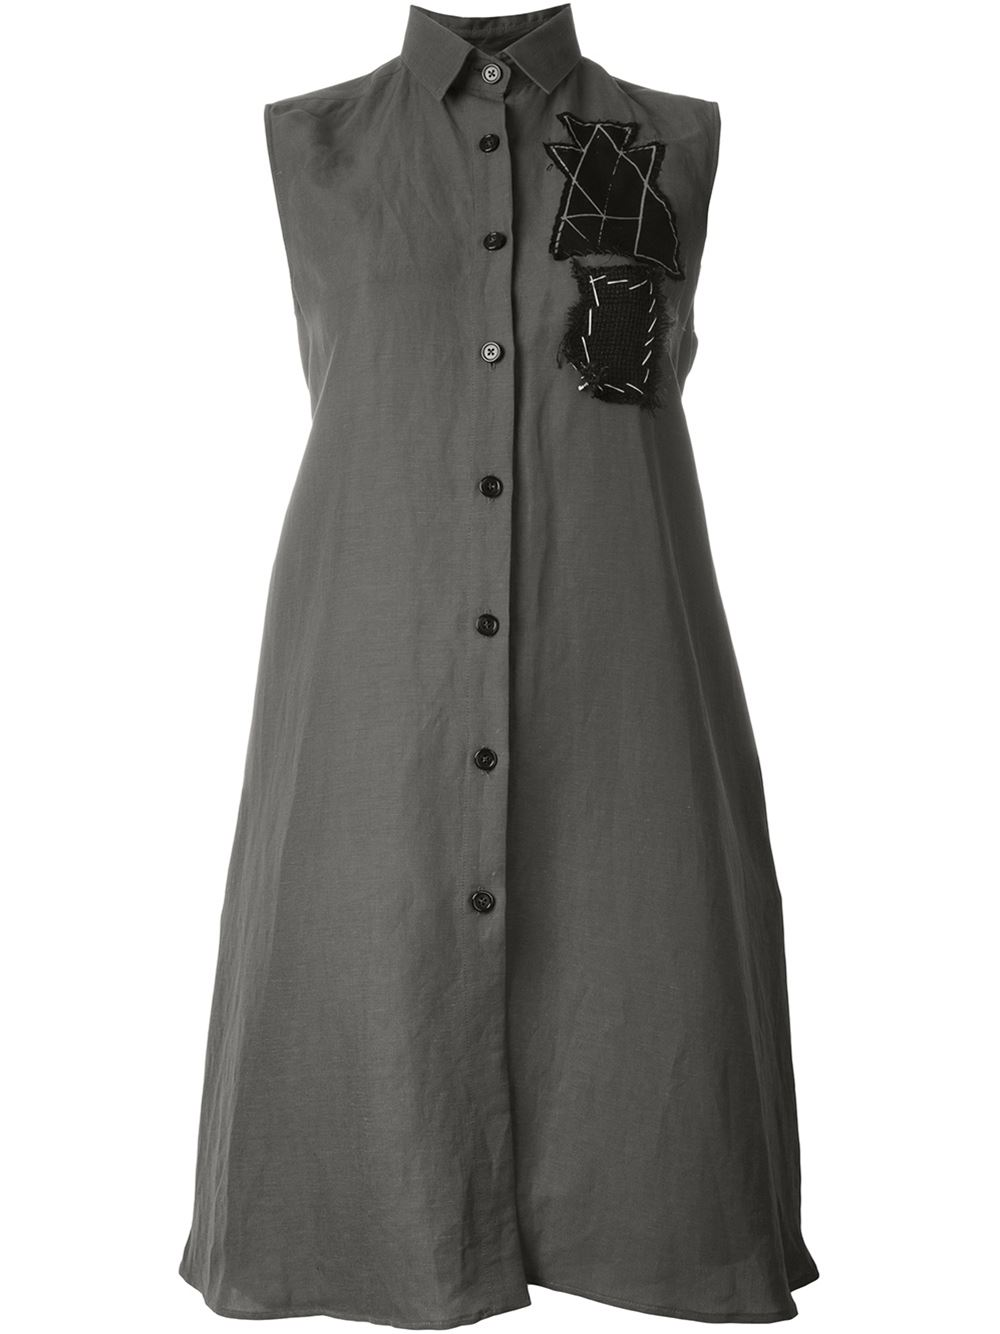 Bell dress, £XX, Heikke Salonen. www.farfetch.com